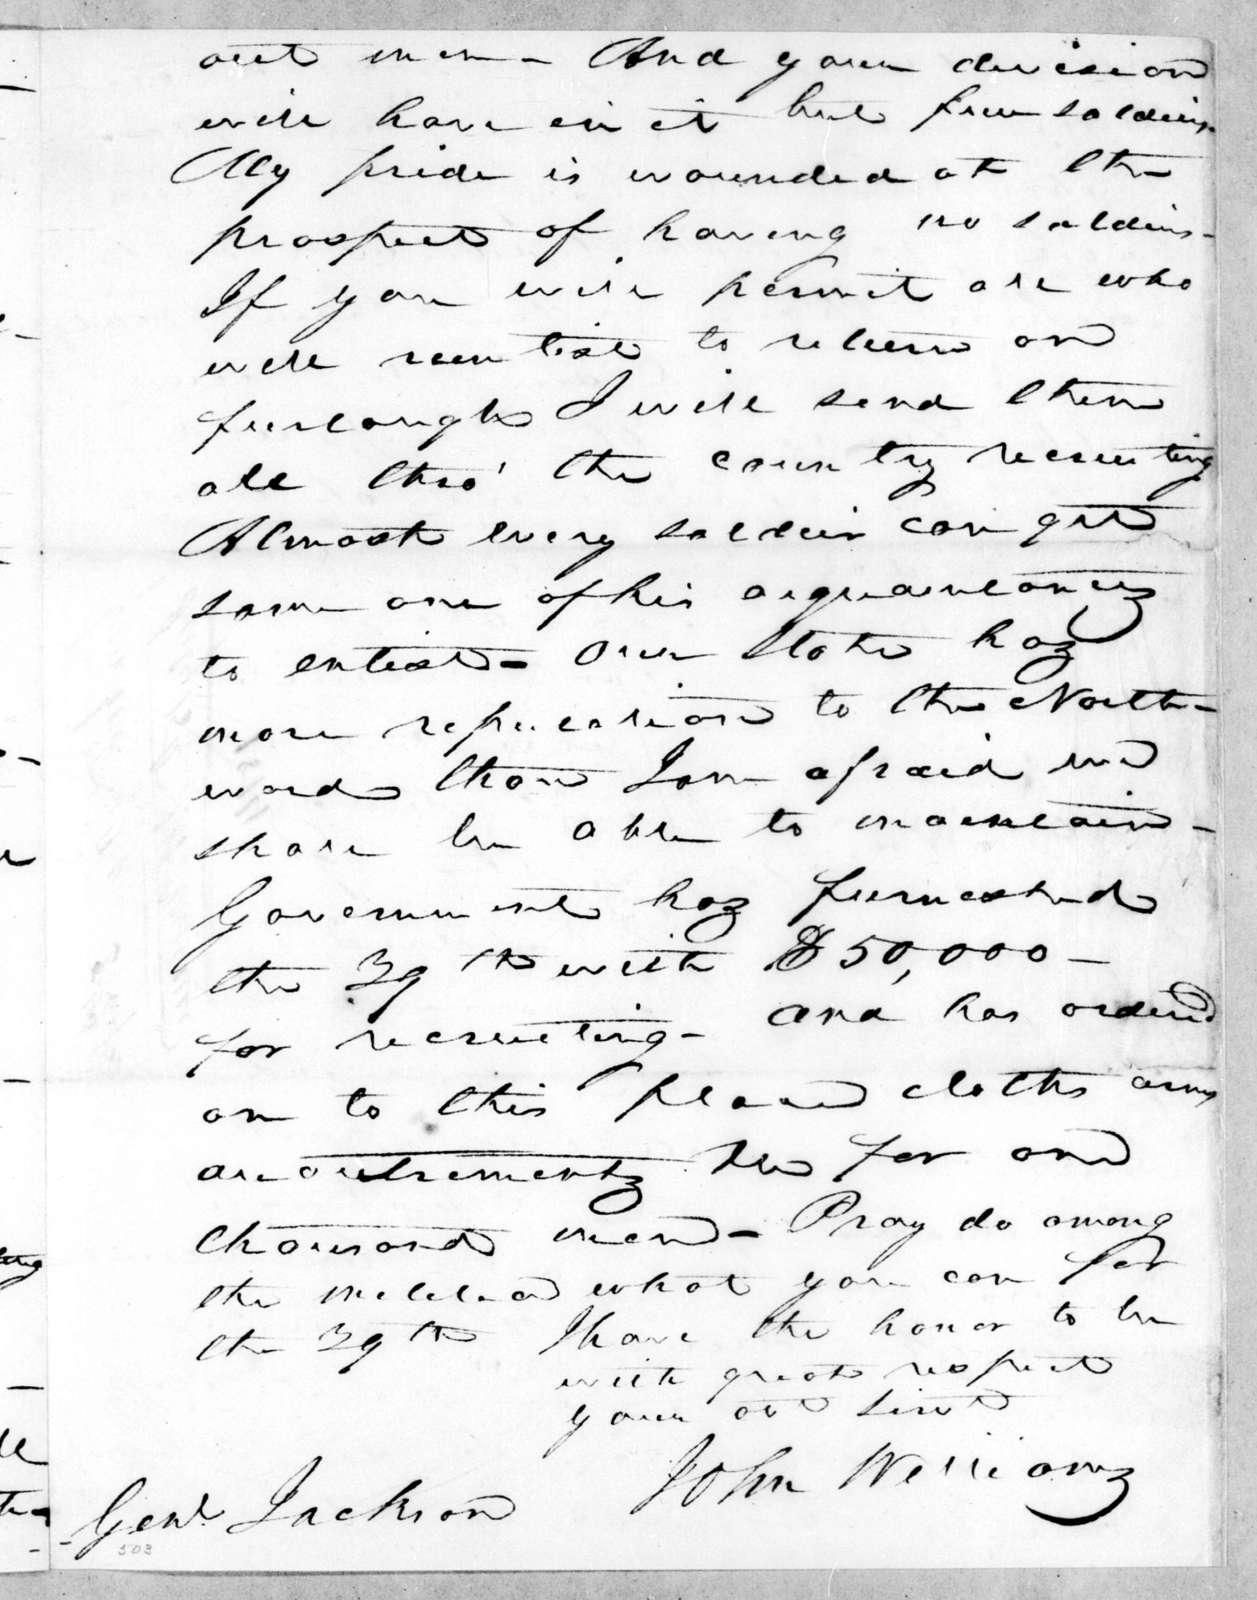 John Williams to Andrew Jackson, July 15, 1814